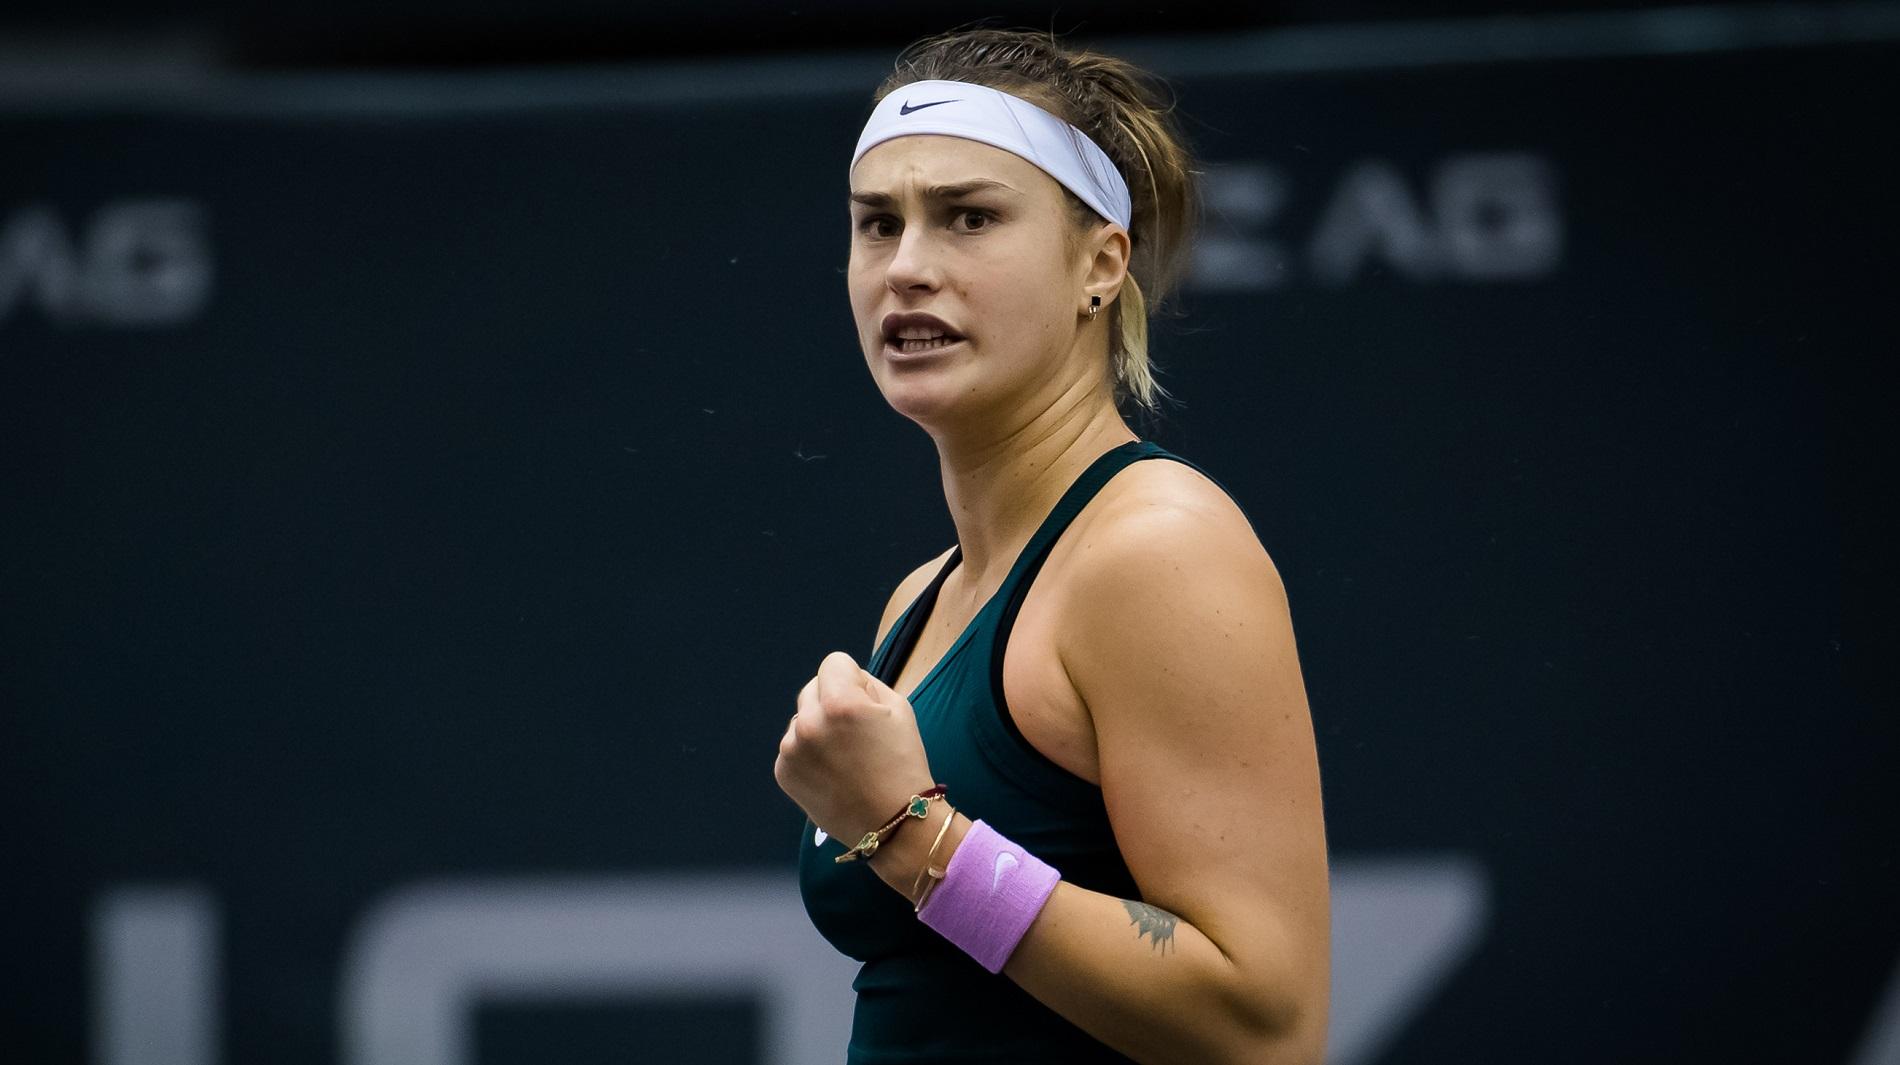 TENNIS : 2020 Upper Linz WTA International tennis tournament Autriche - 14/11/2020